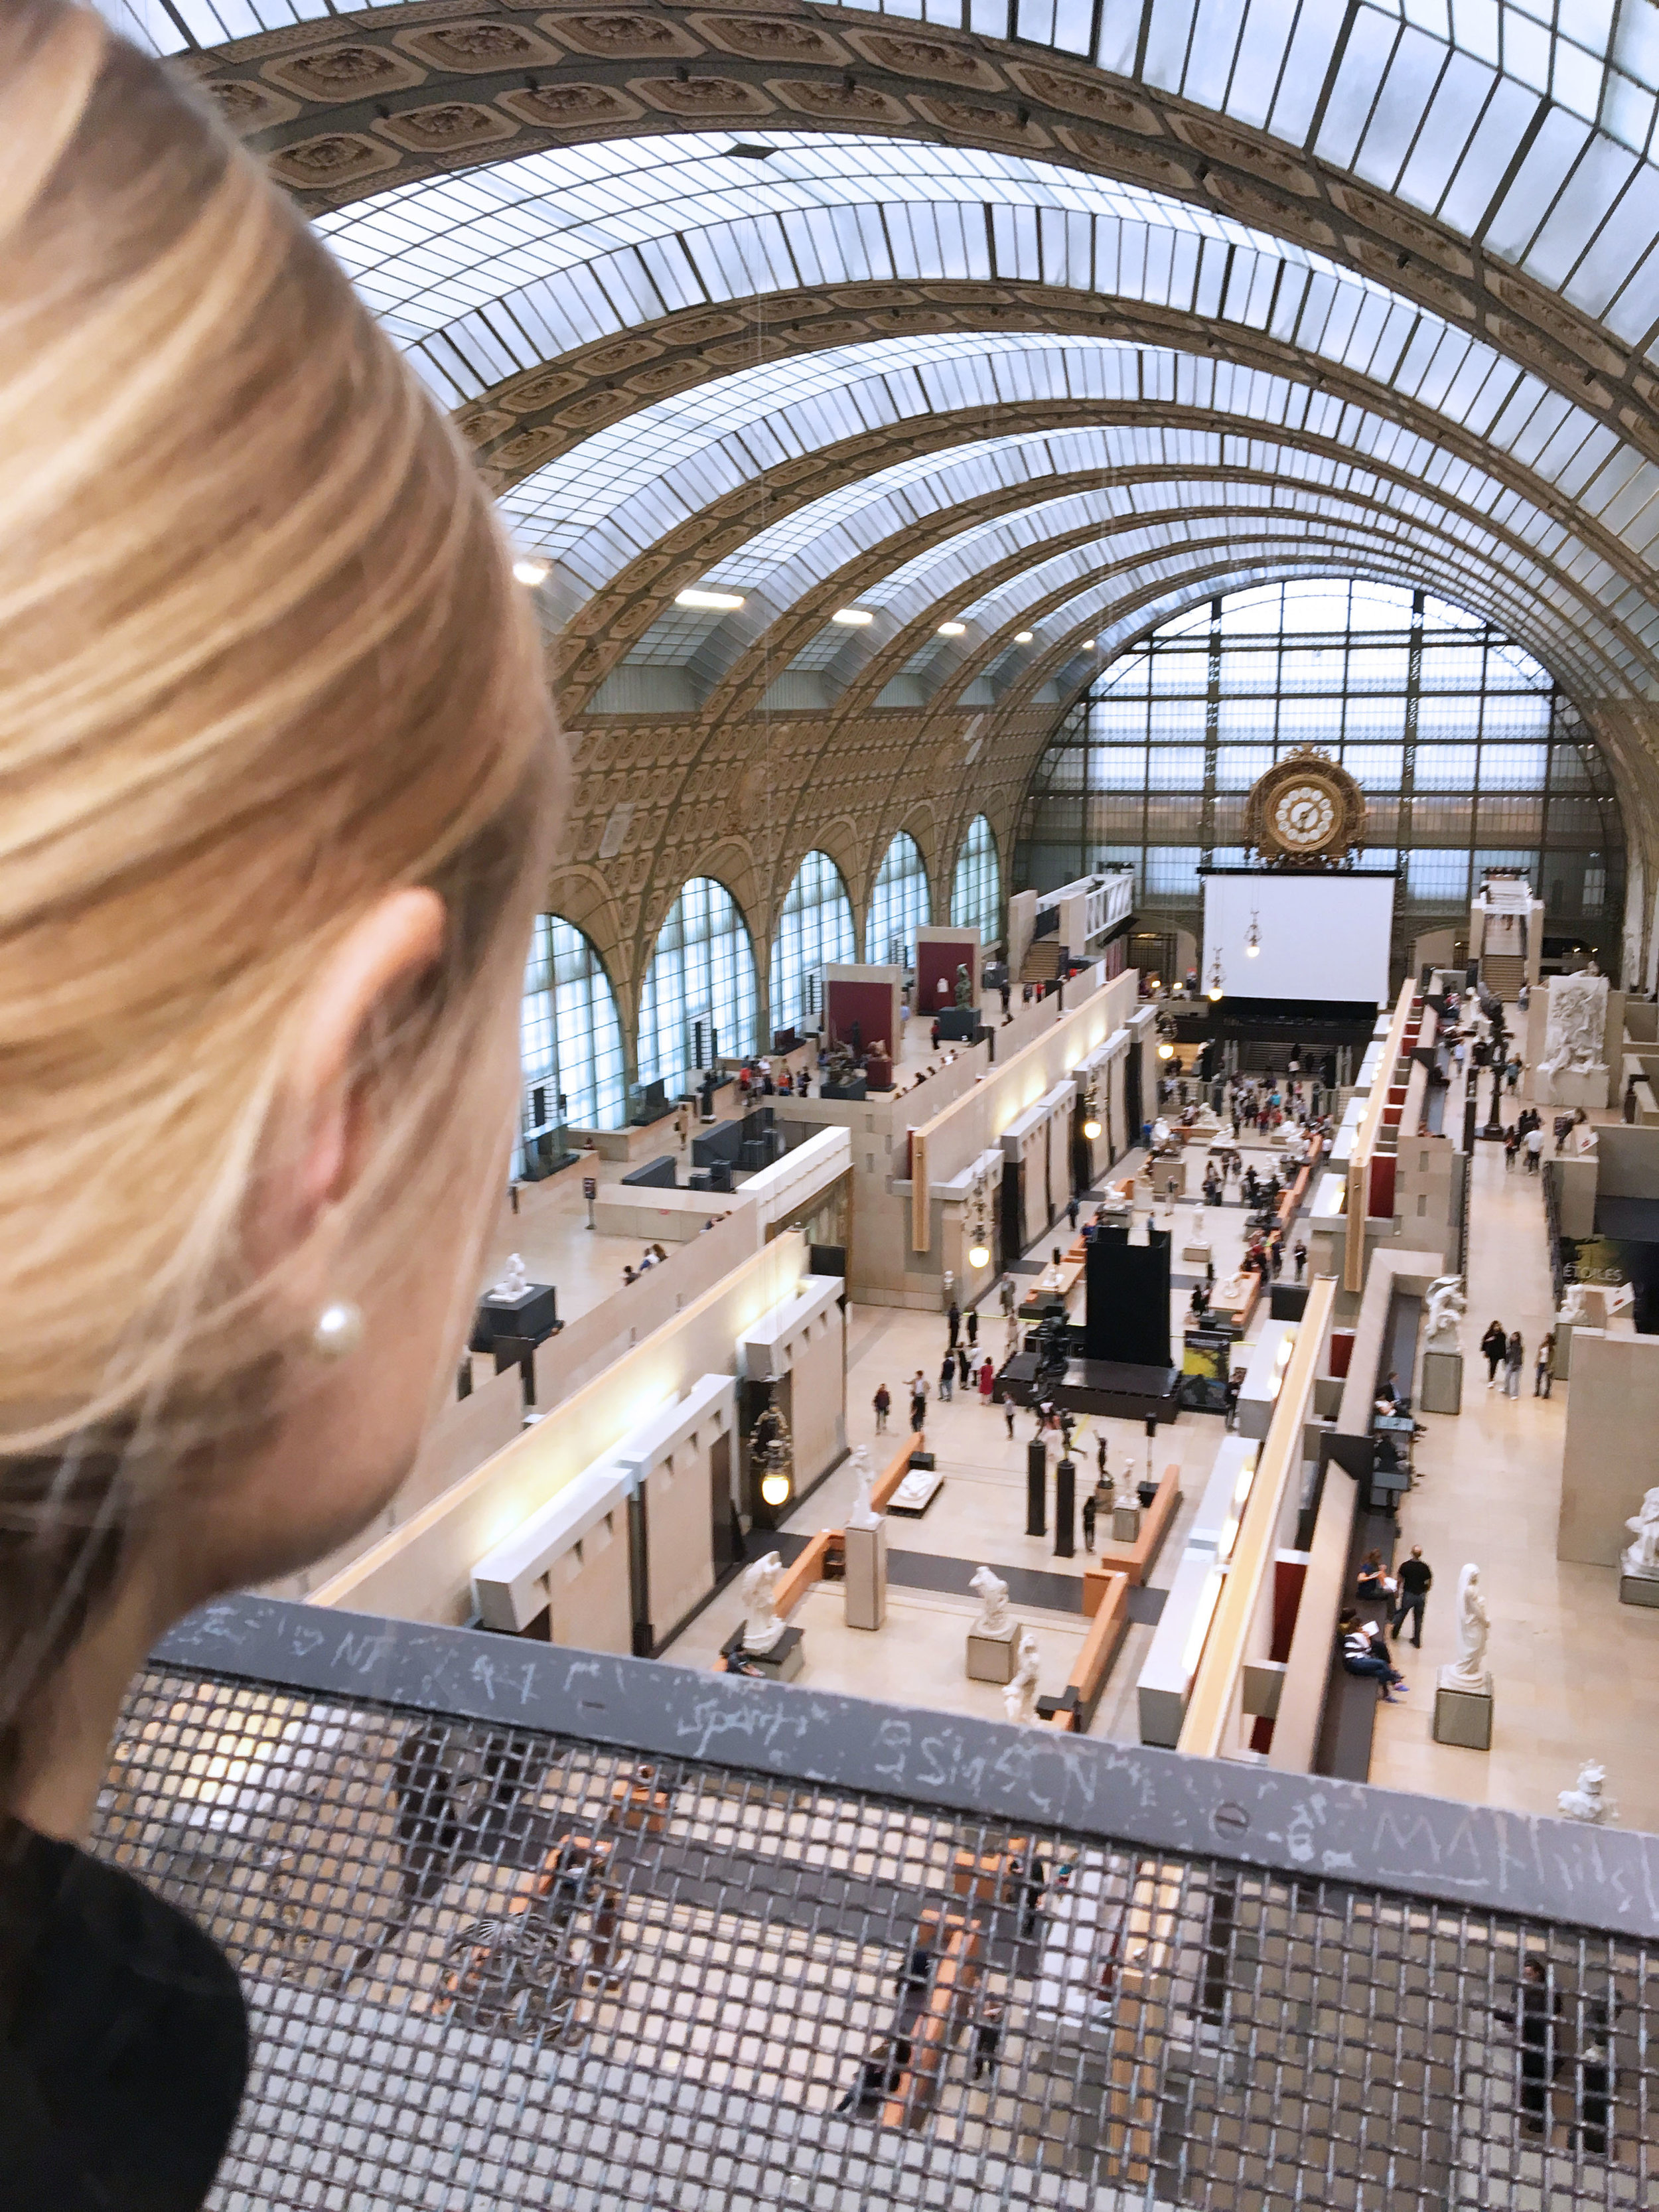 The top-floor lookout inside the Musée d'Orsay.